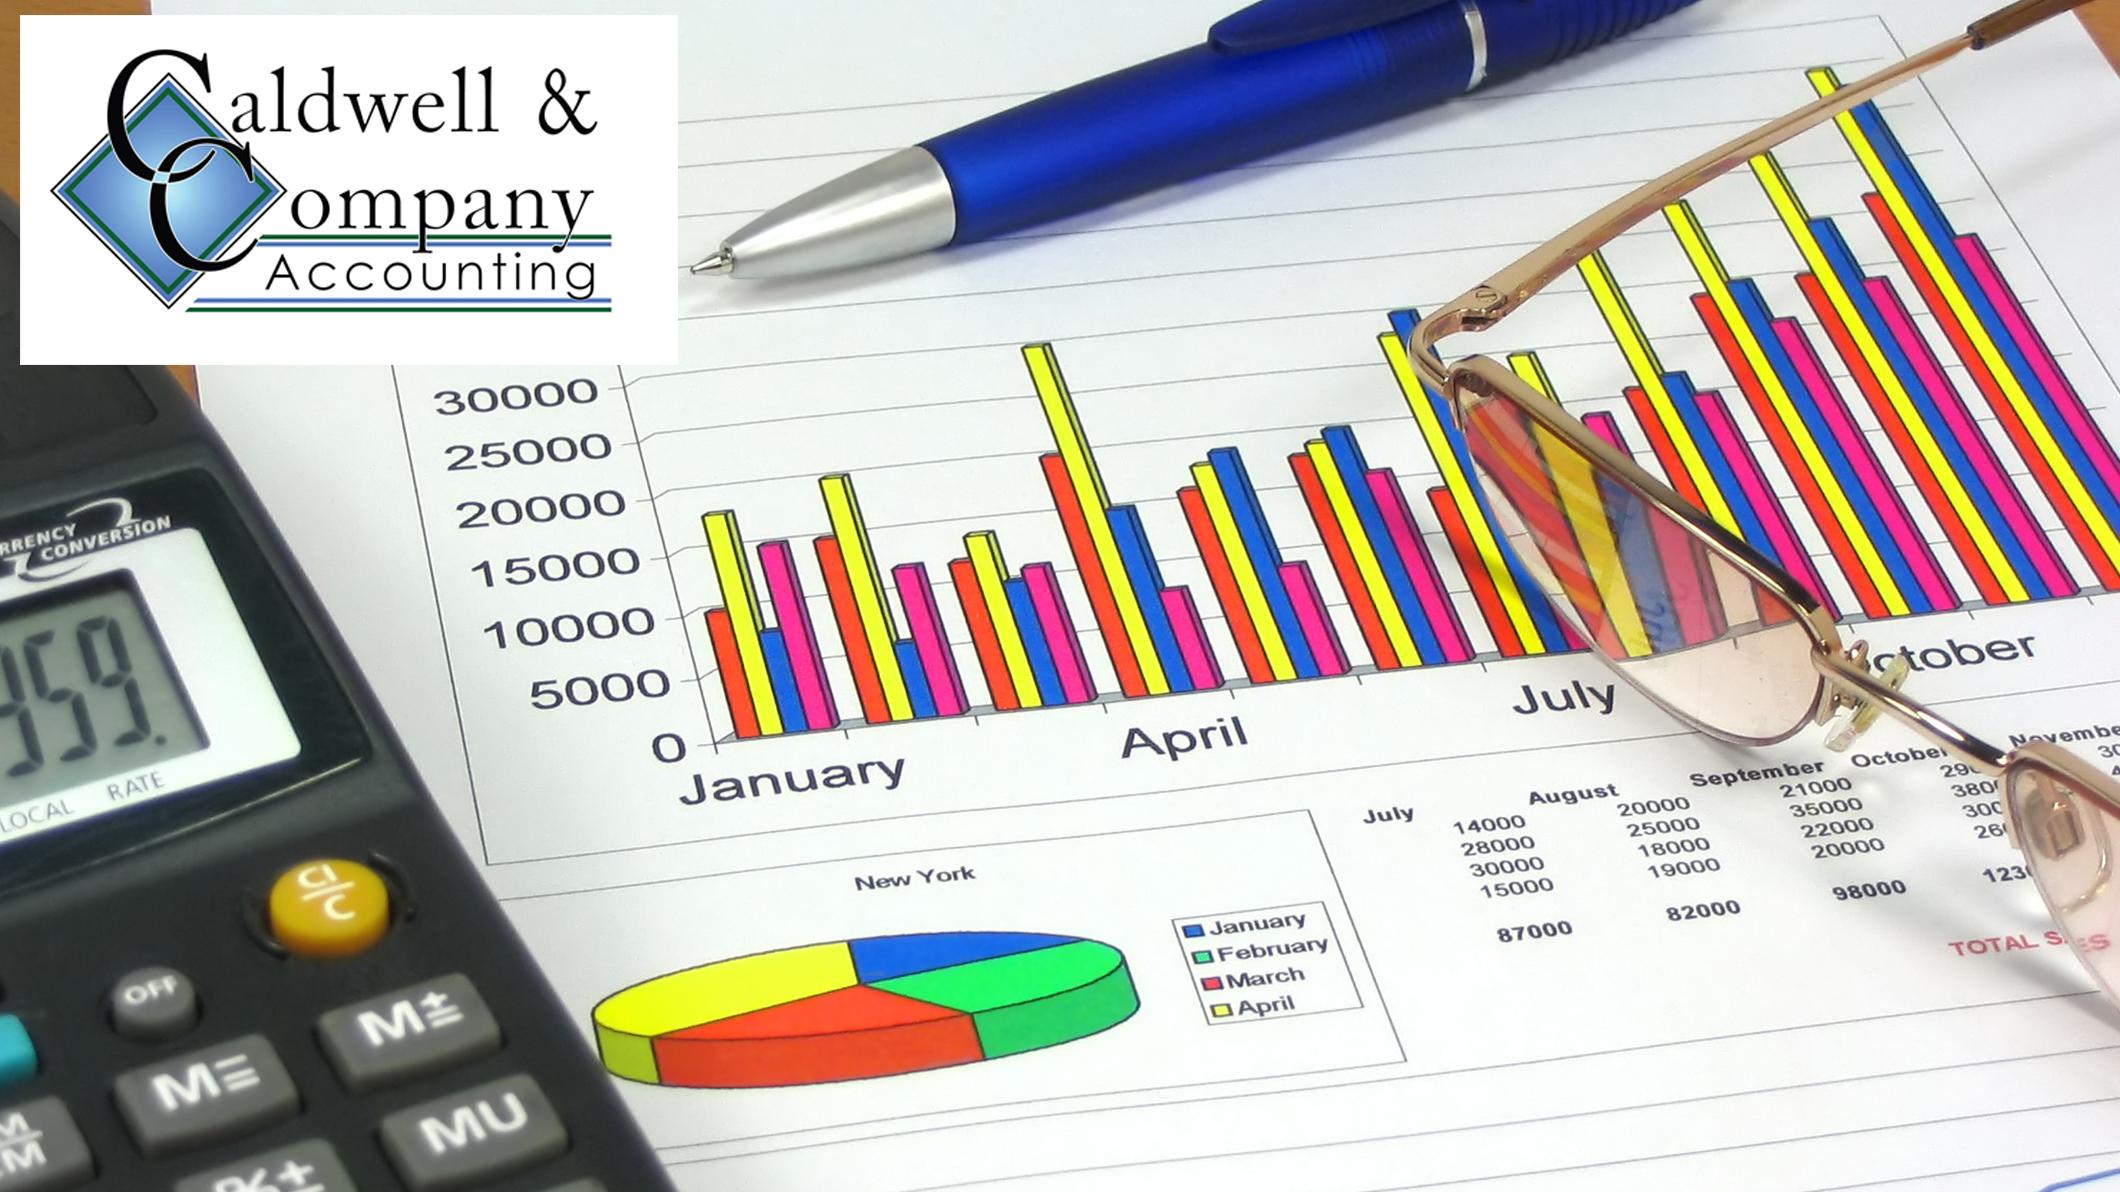 Caldwell & Company Accounting